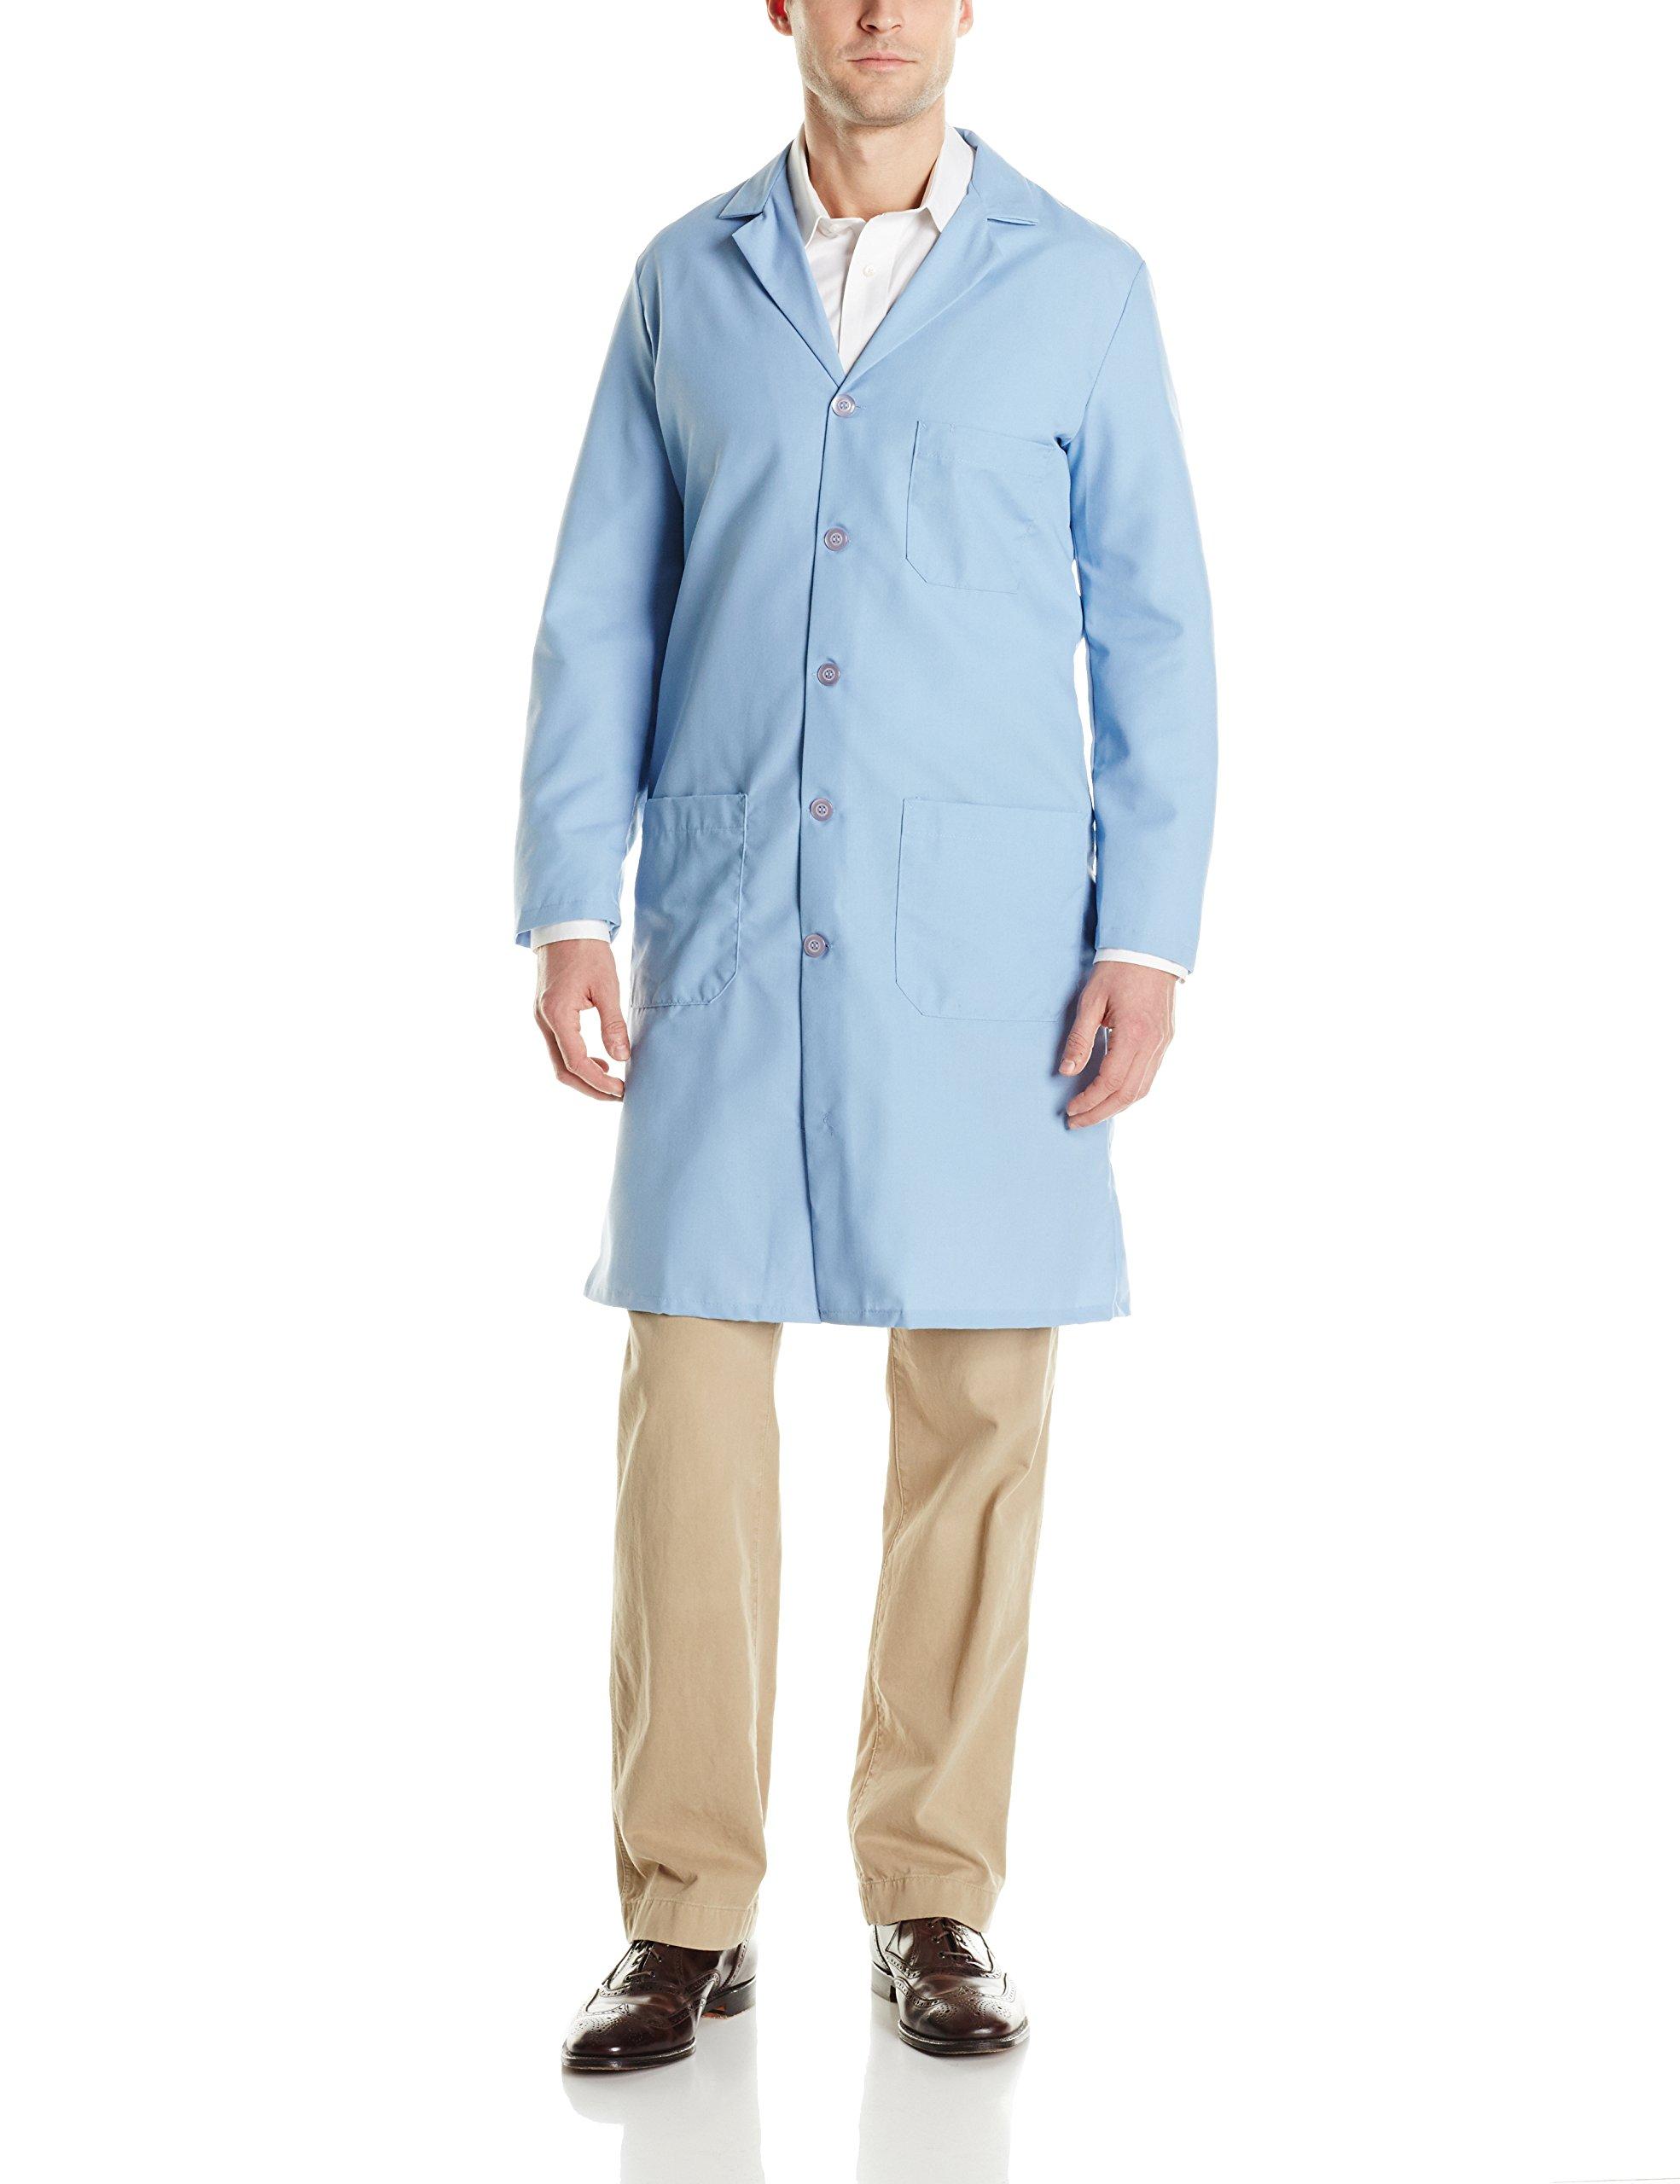 Red Kap Men's Exterior Pocket Original Lab Coat, Light Blue, 40 by Red Kap